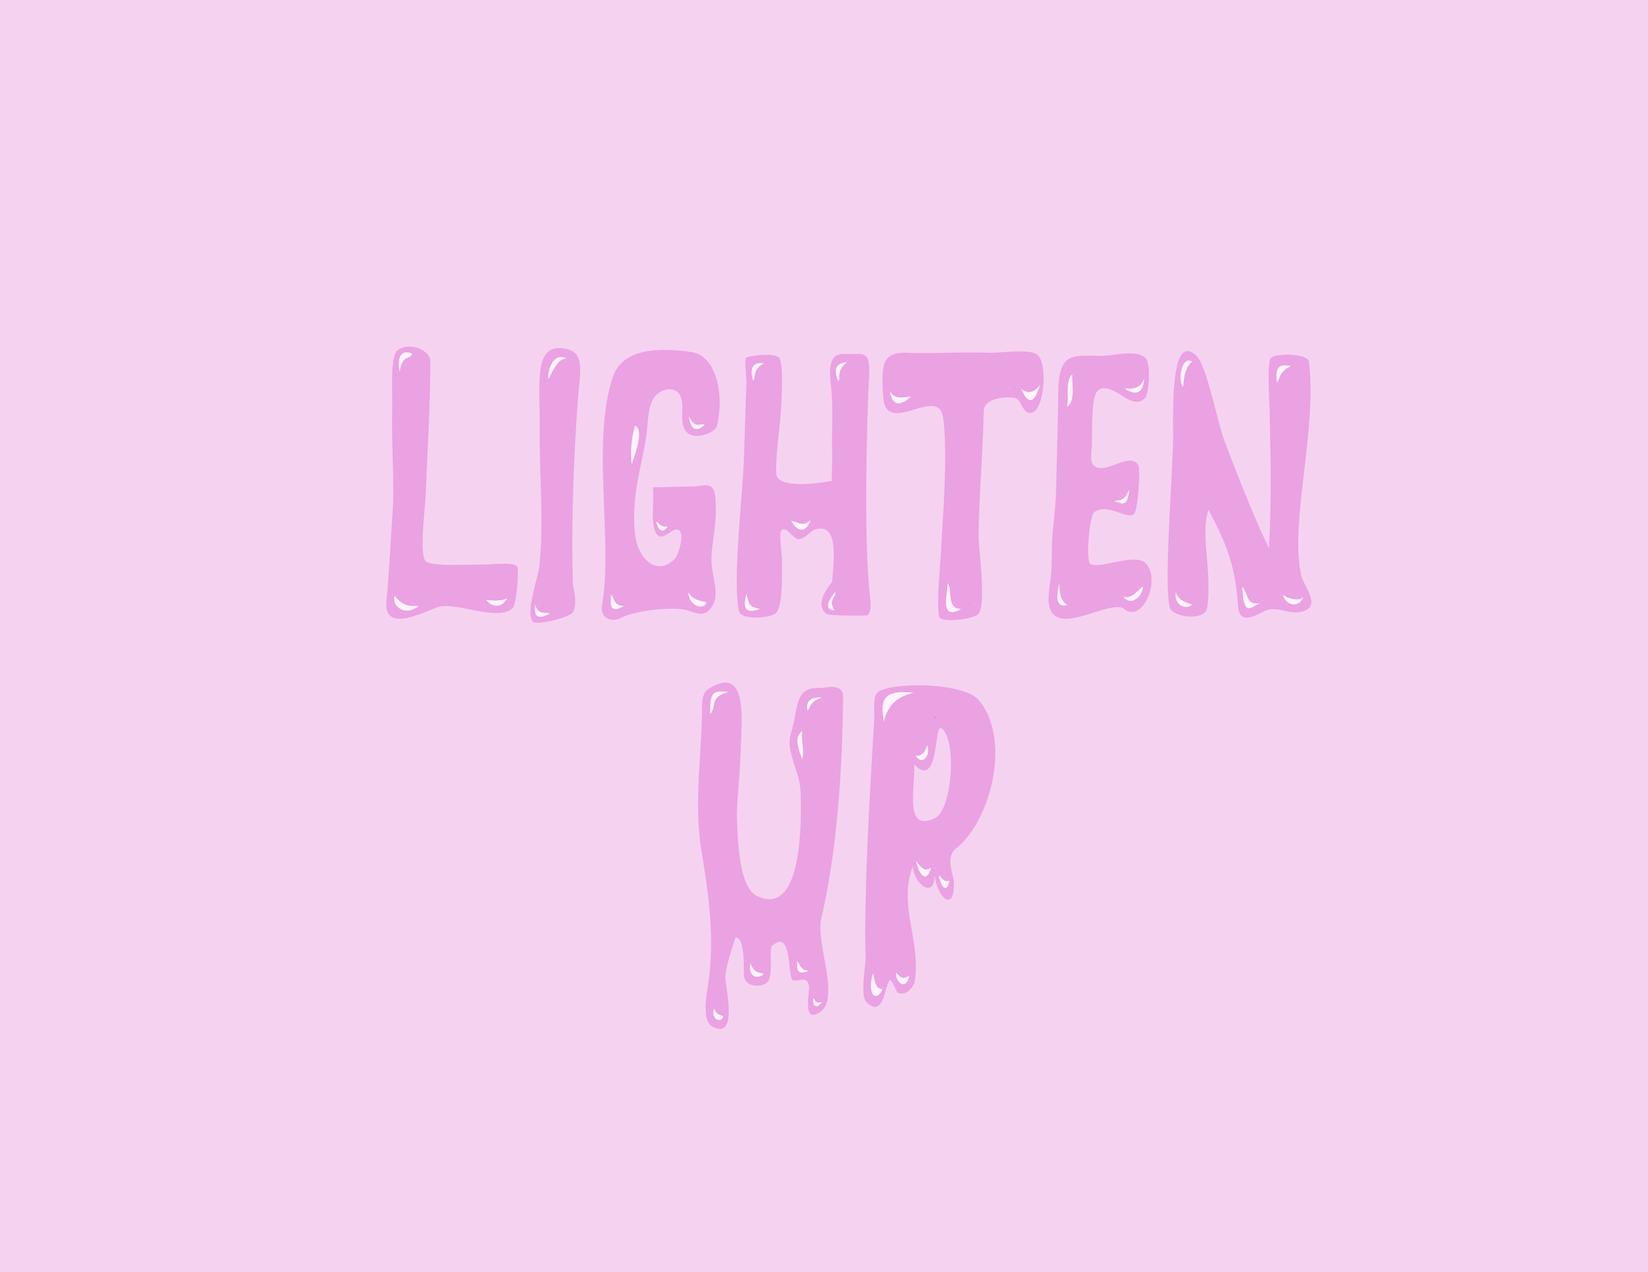 lighten up edit.png